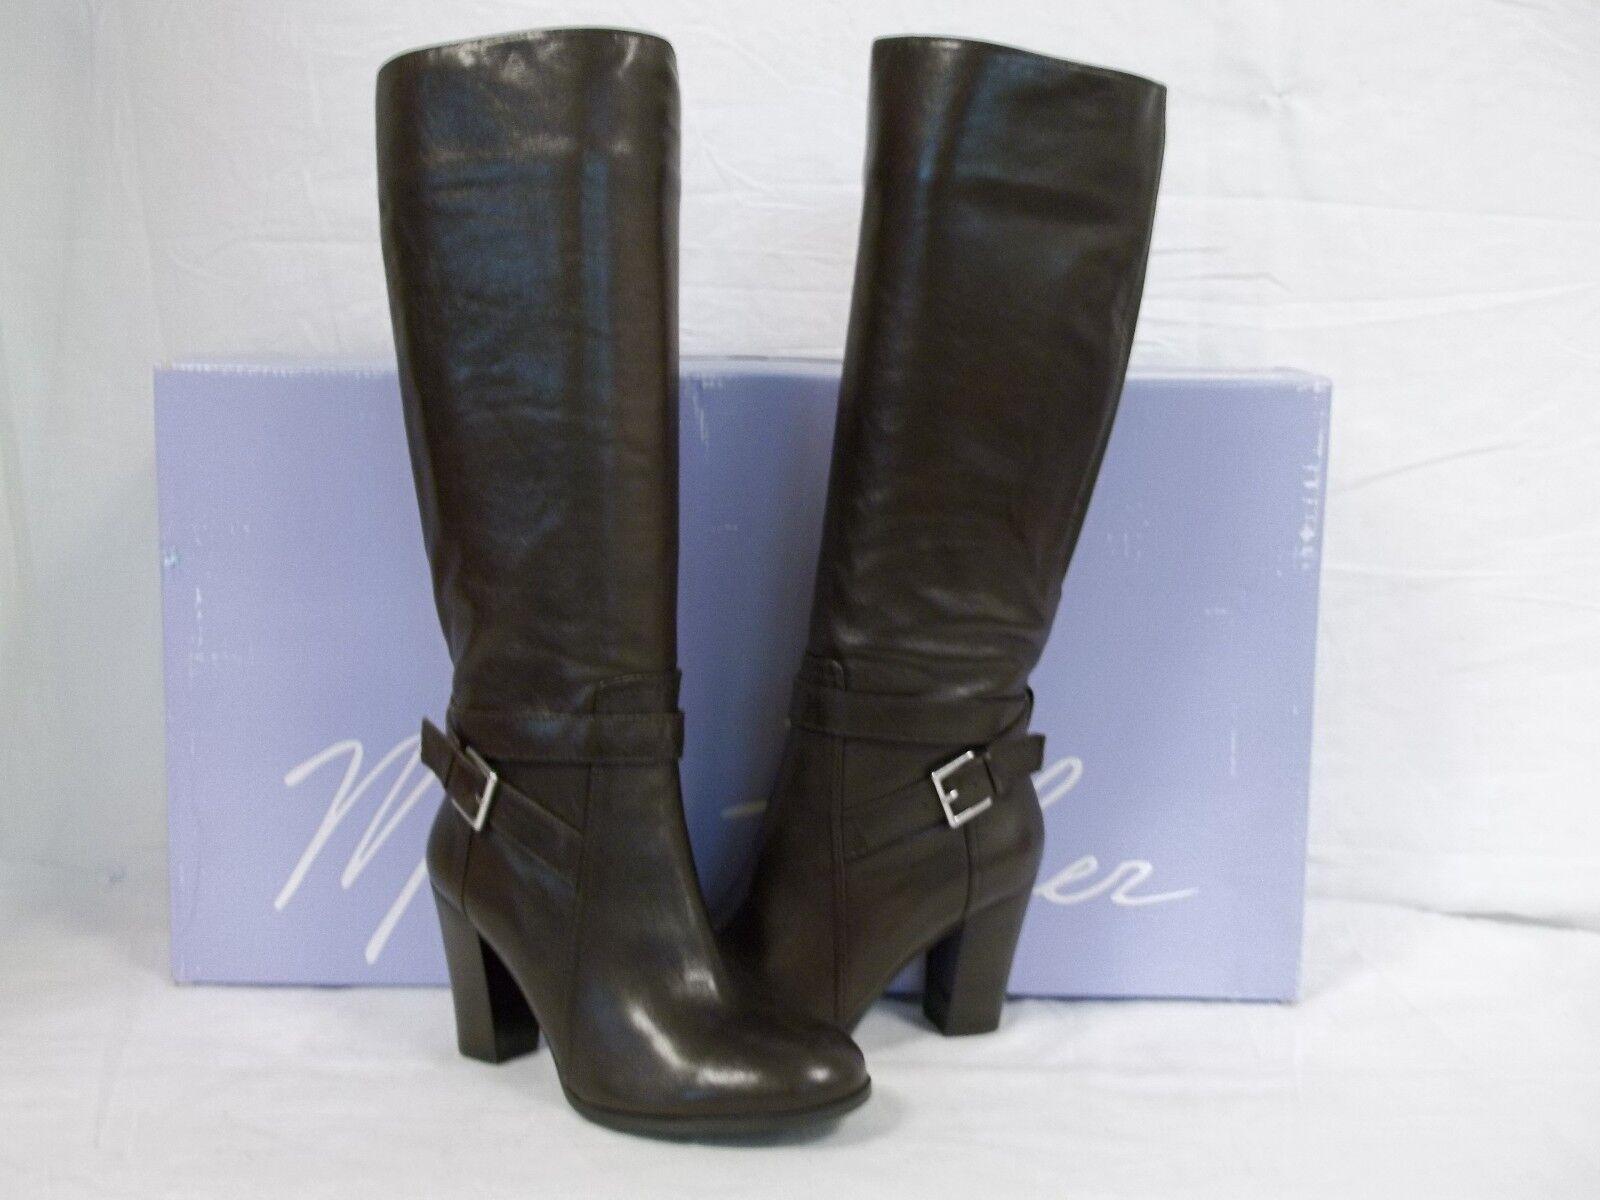 Marc Fisher Sz 5 M Kessler Dark Braun Leder Knee High Stiefel NEU Damenschuhe Schuhes